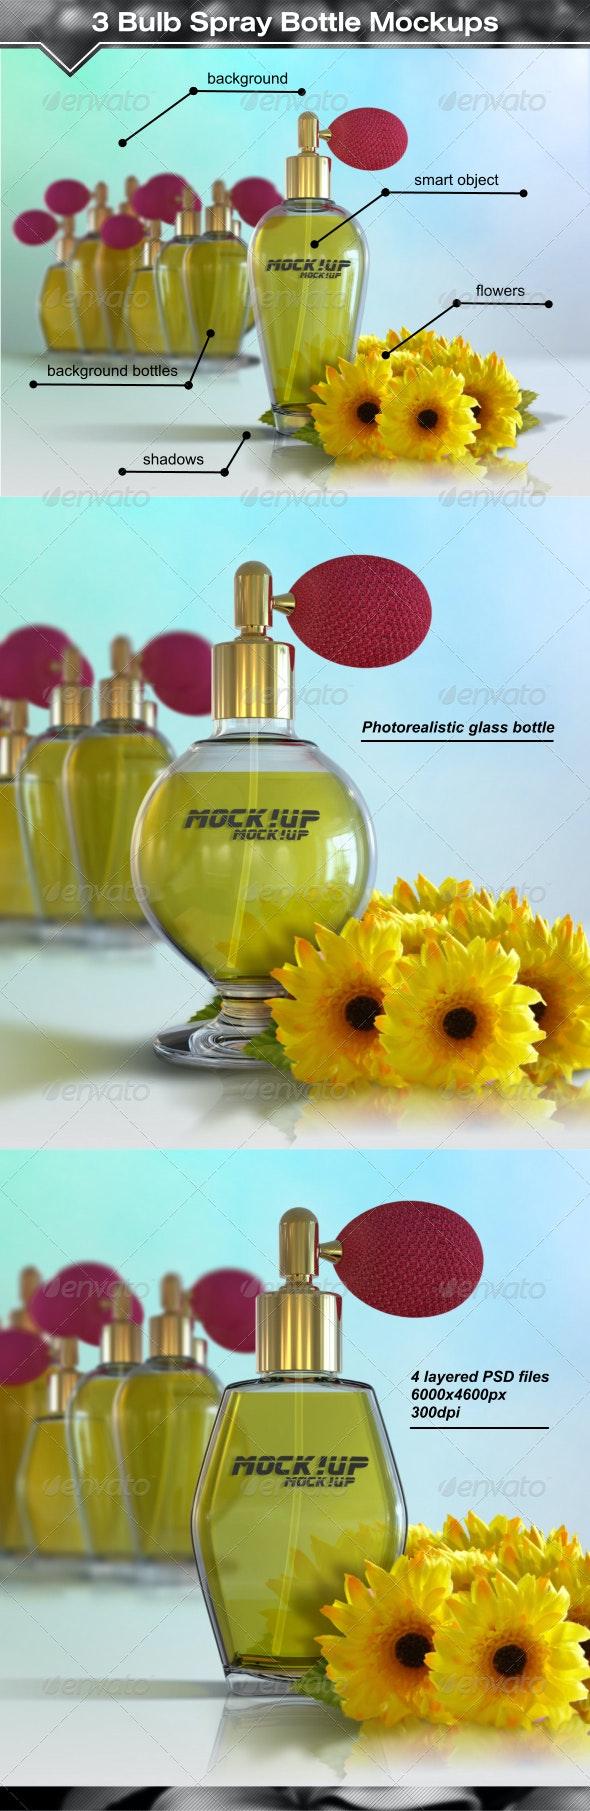 3 Antique Style Bulb Spray Bottle Mockups - Beauty Packaging